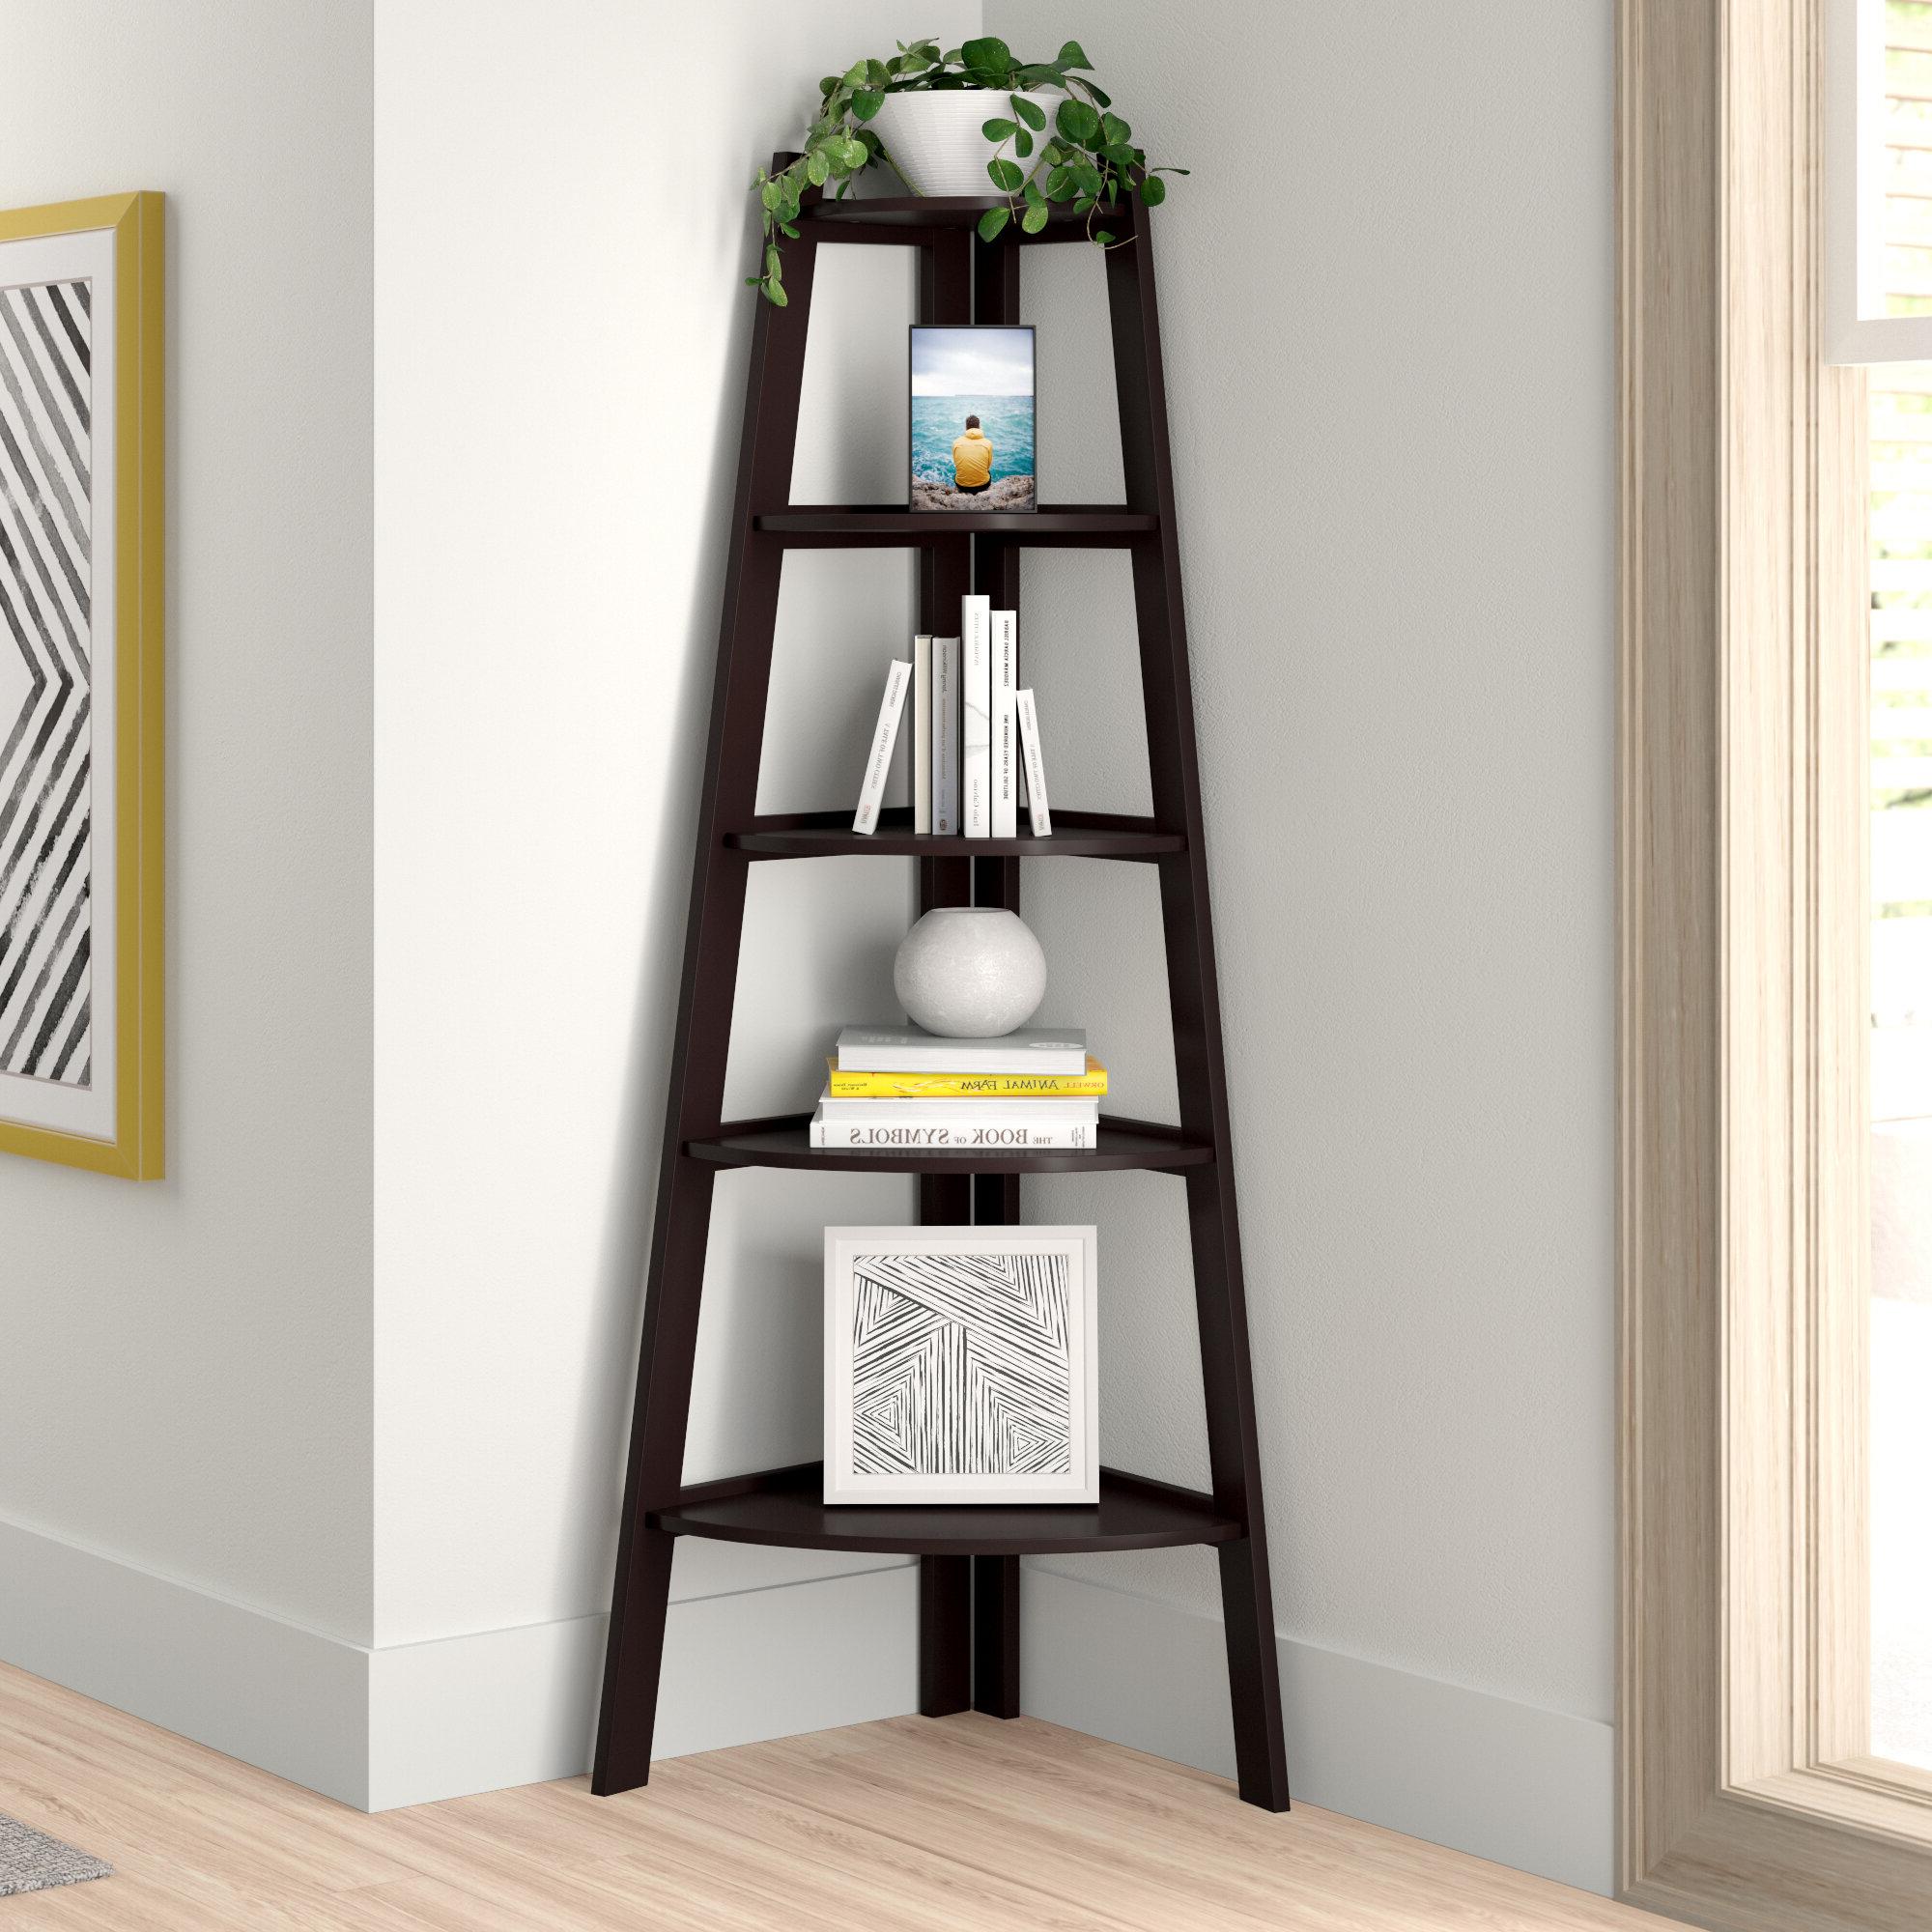 2020 Corner Unit Bookcases For Tisha Corner Bookcase (View 8 of 20)